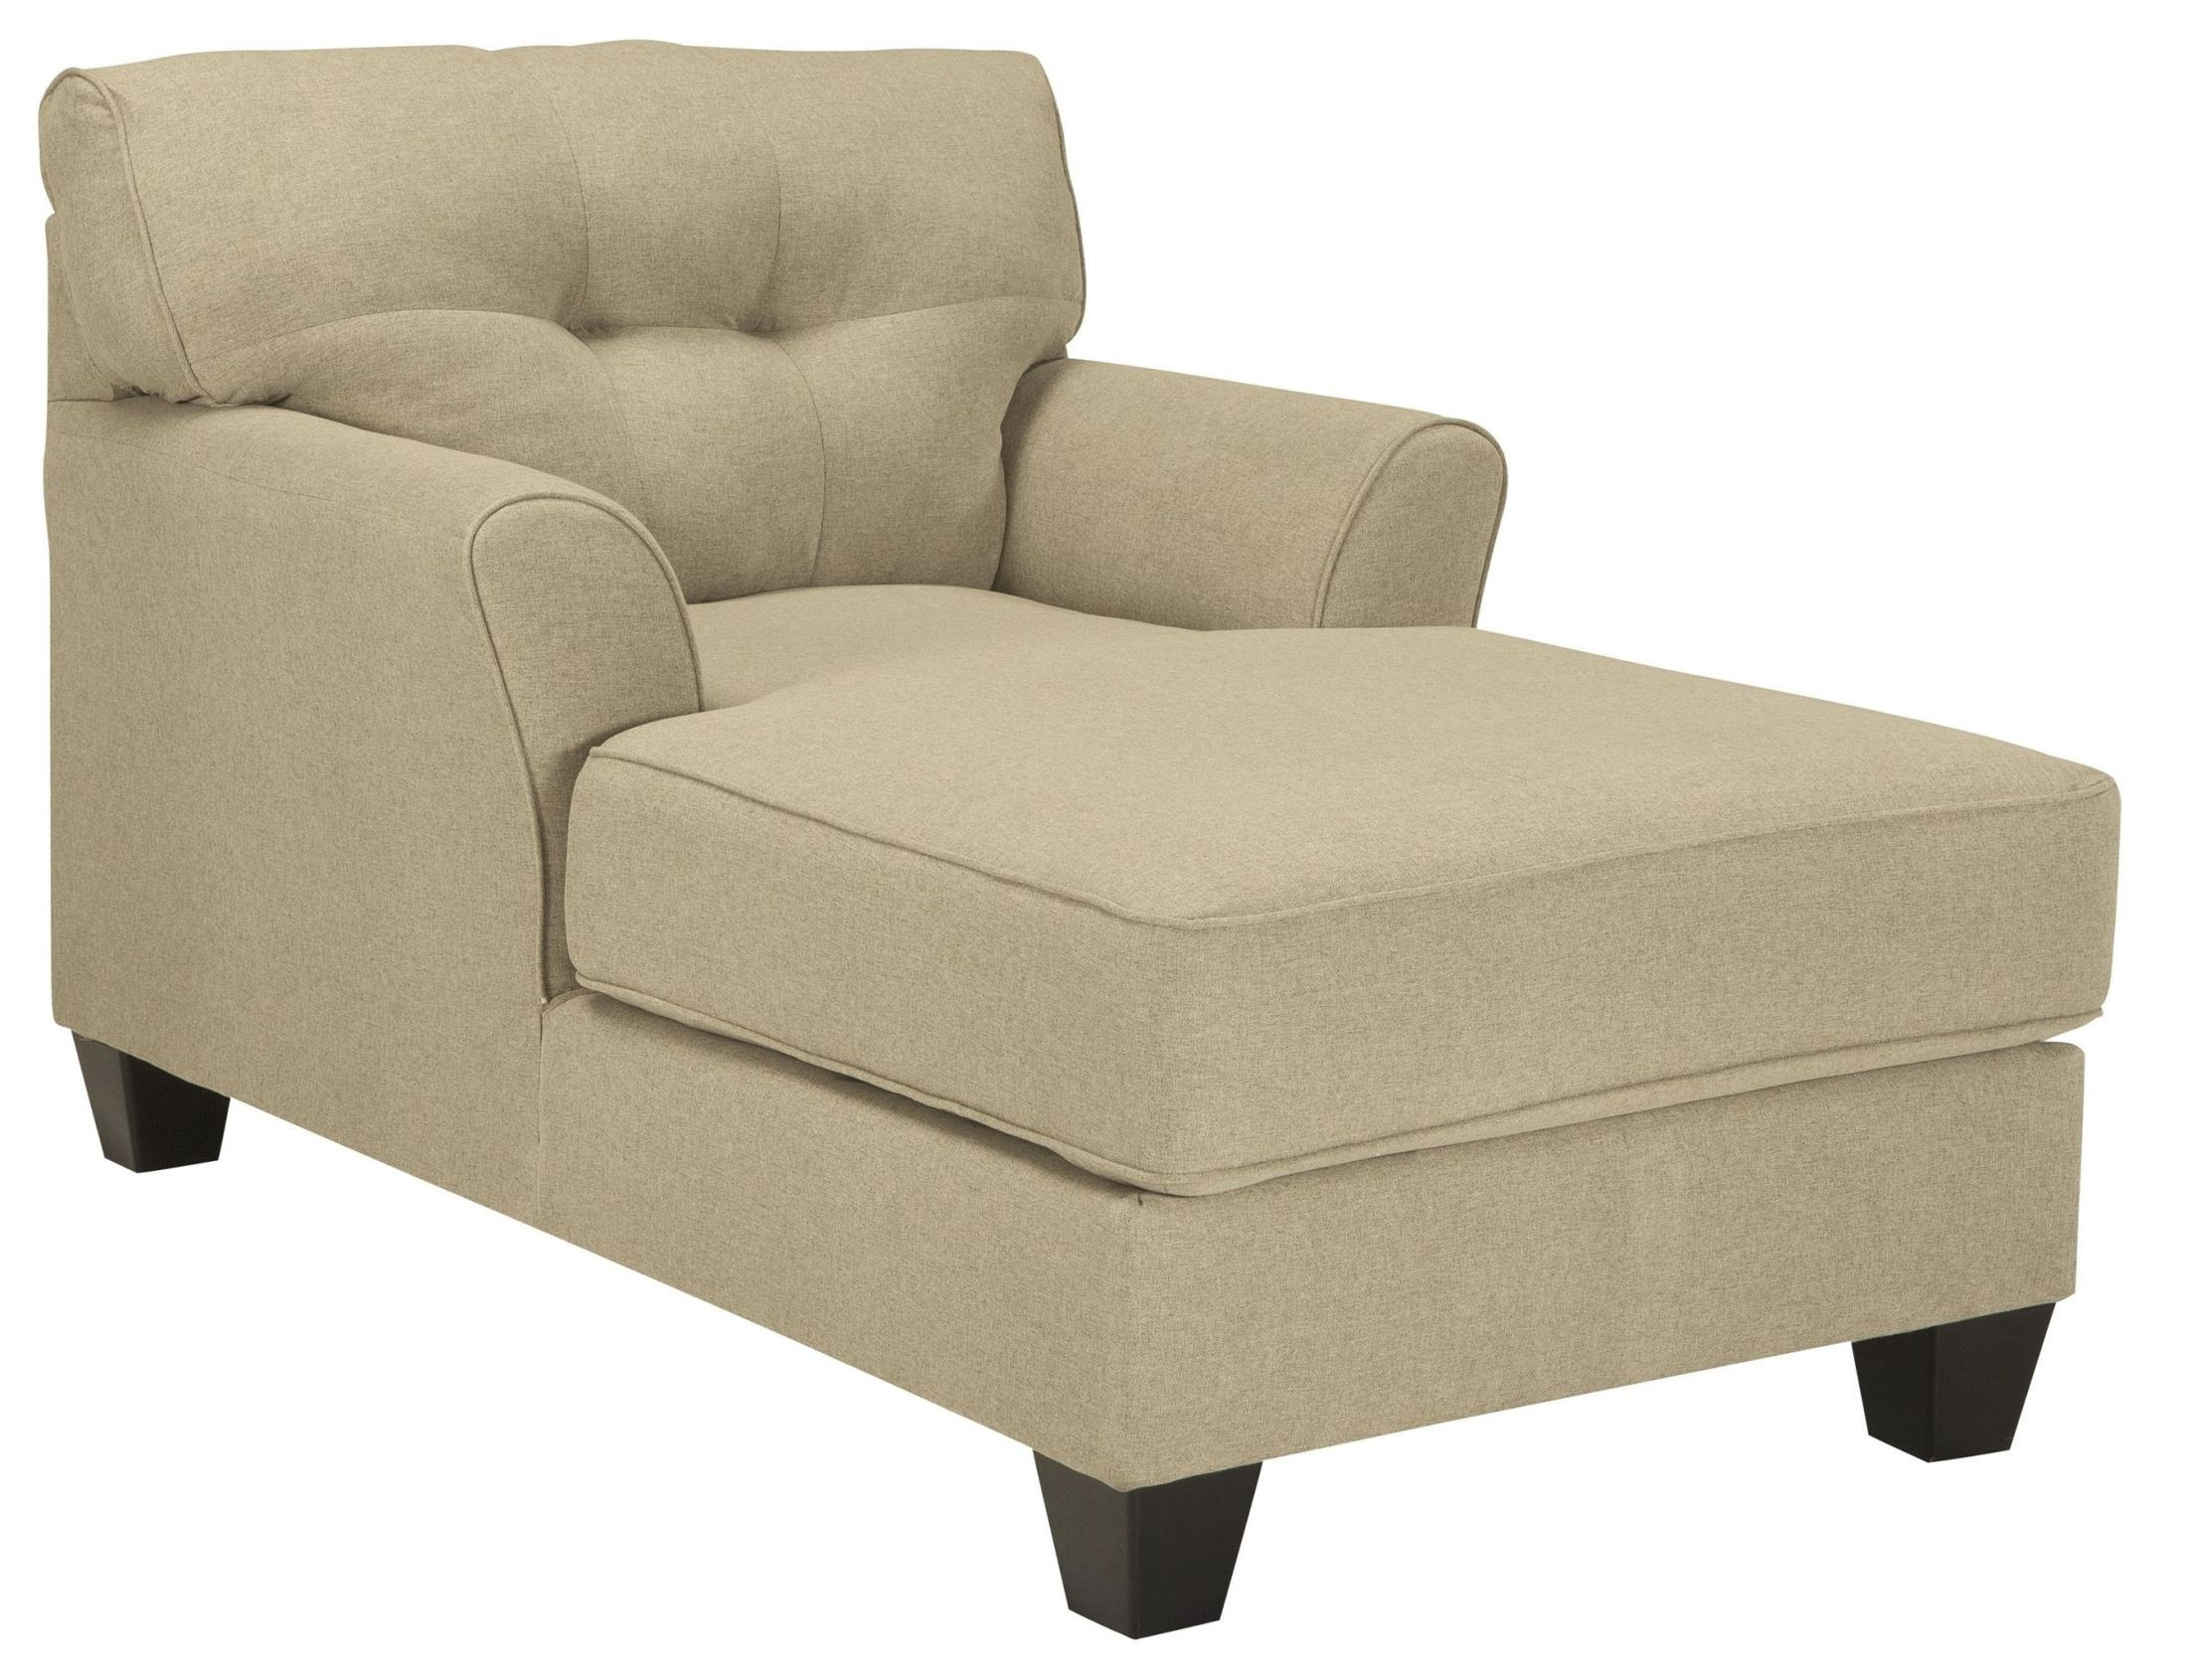 Laryn khaki chaise from ashley 5190215 coleman furniture for Chaise kaki